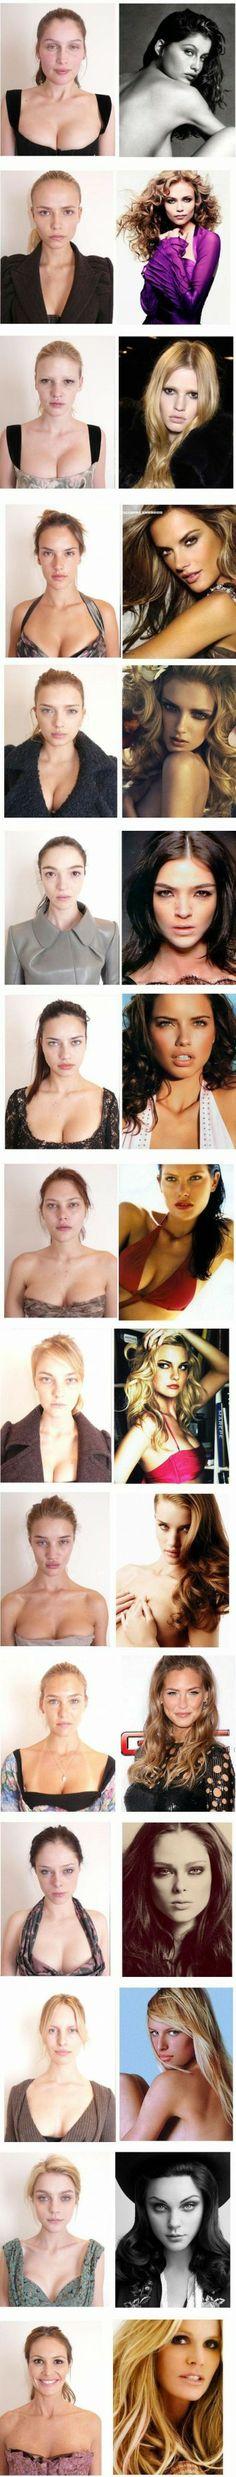 Makyajsız modeller